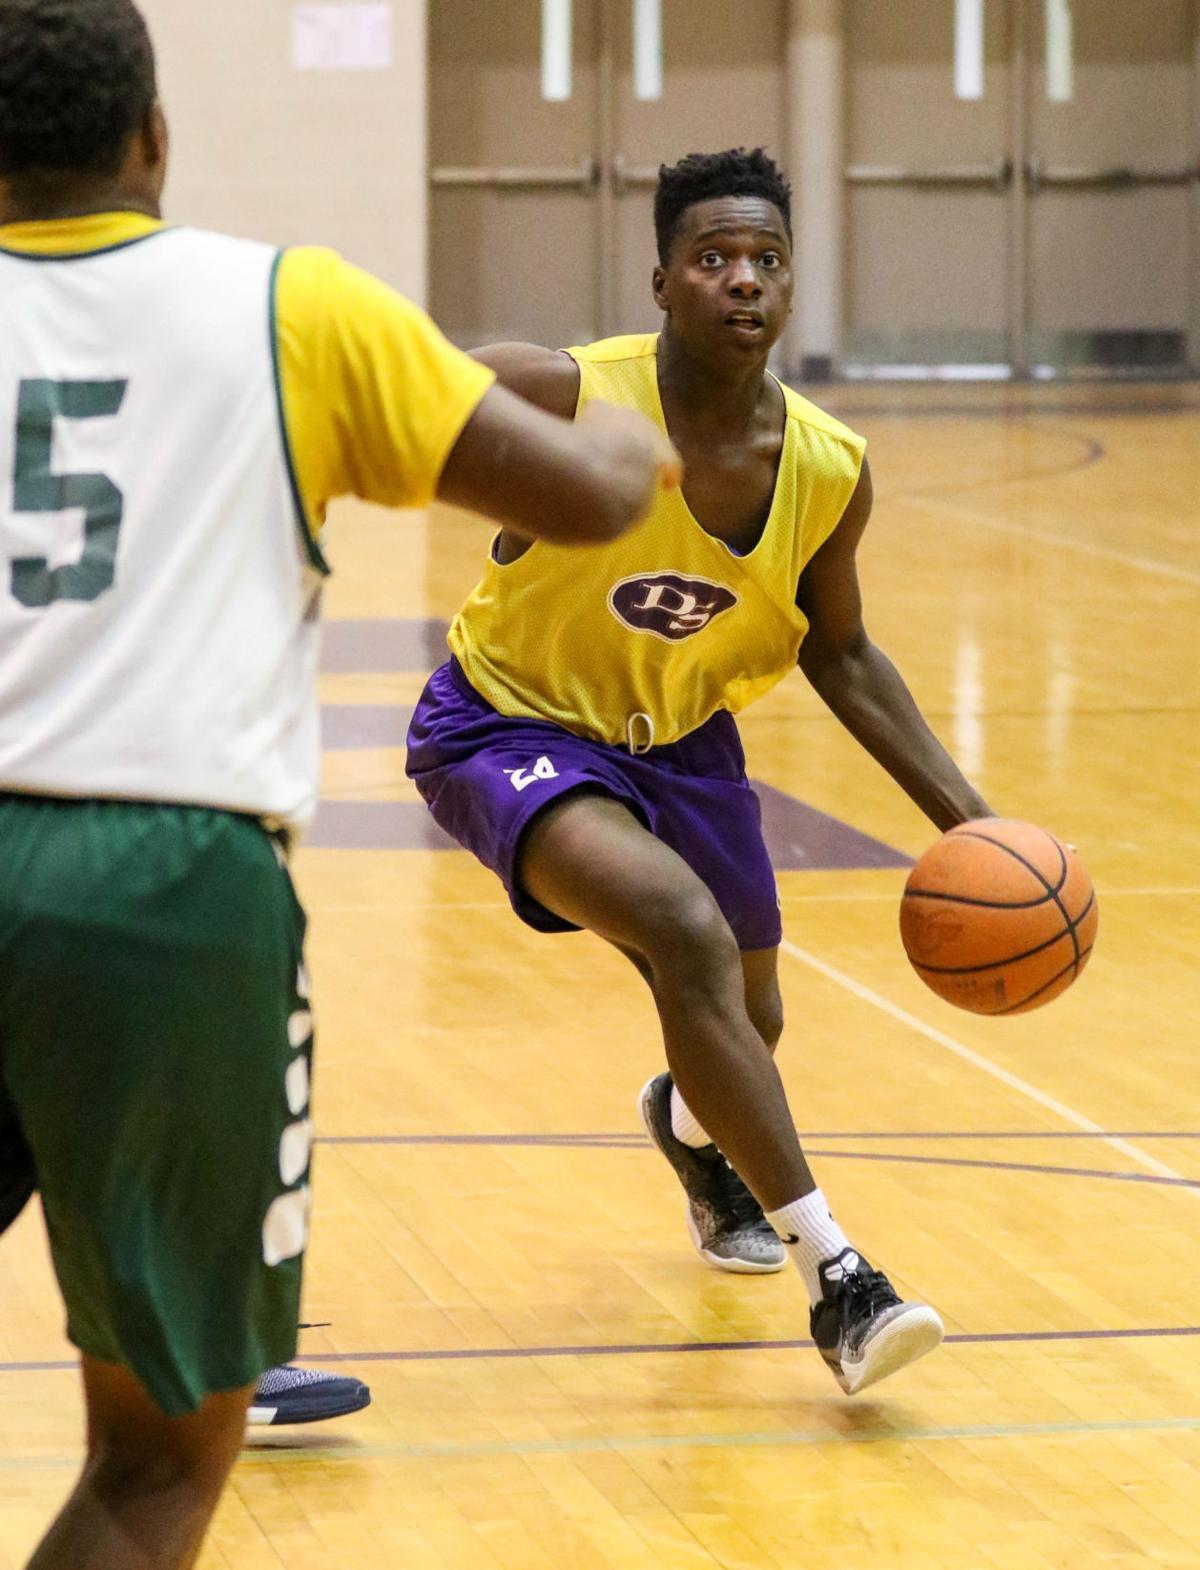 DSHS-Walker basketball Jabarry Fortenbarry